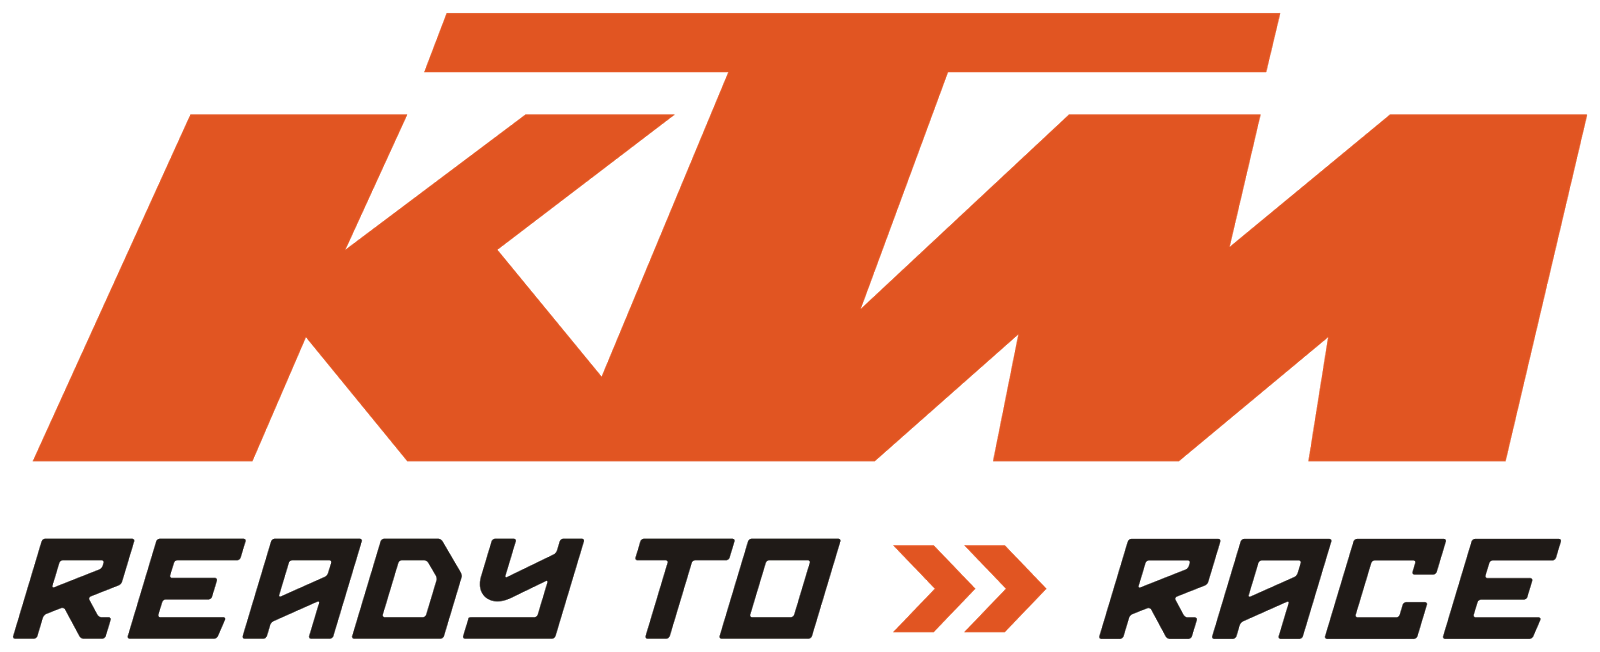 image freeuse stock Logo ktm ready to. Vector emblem racing